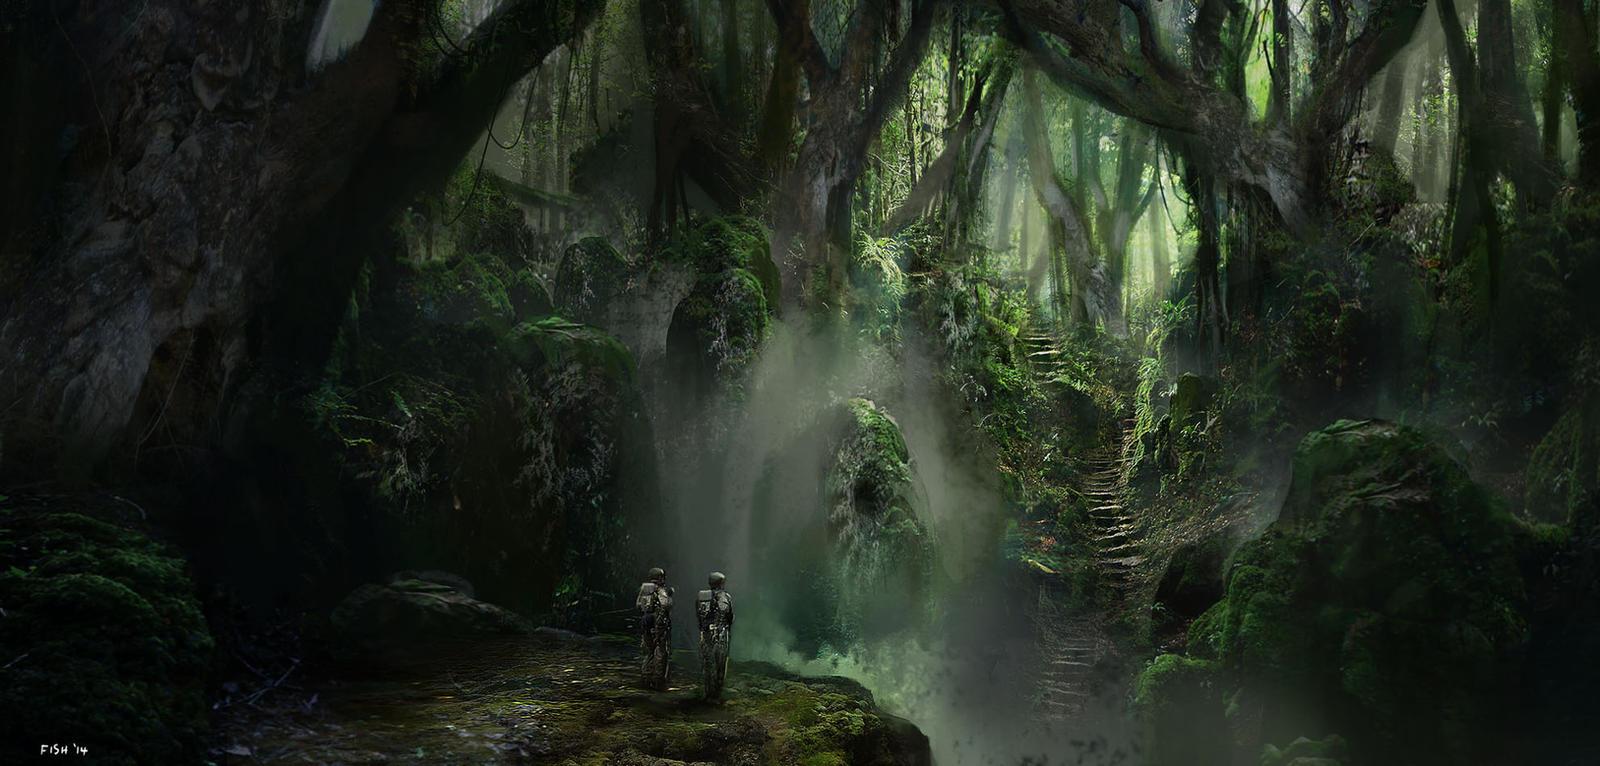 jungle_mist_by_fish032-d7evt0g.jpg